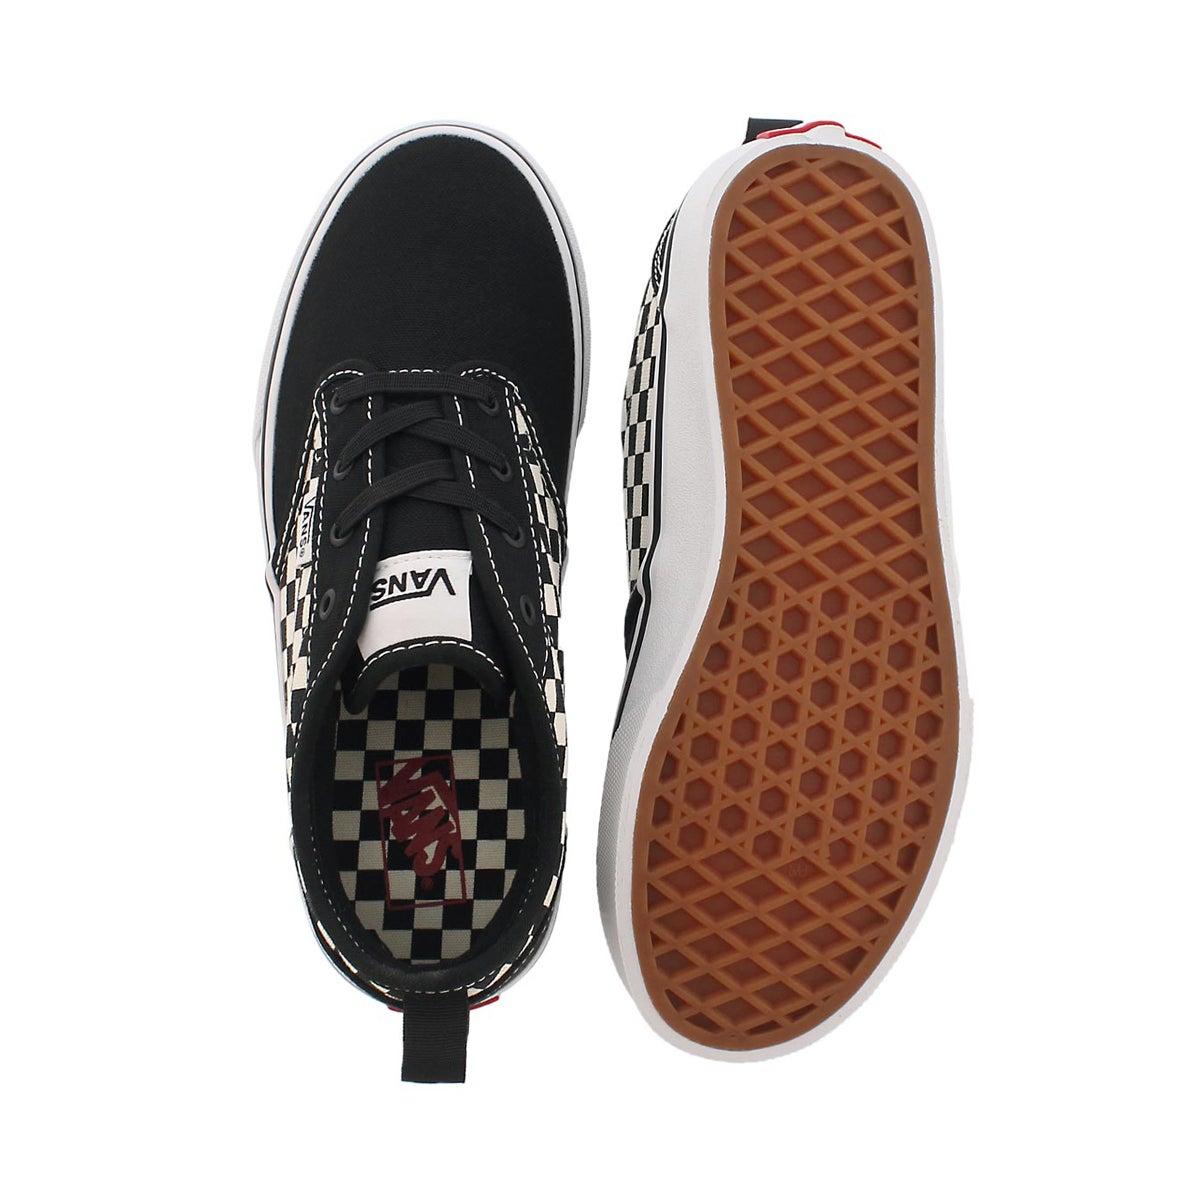 Bys Atwood blk/wht chckrs slipon sneaker